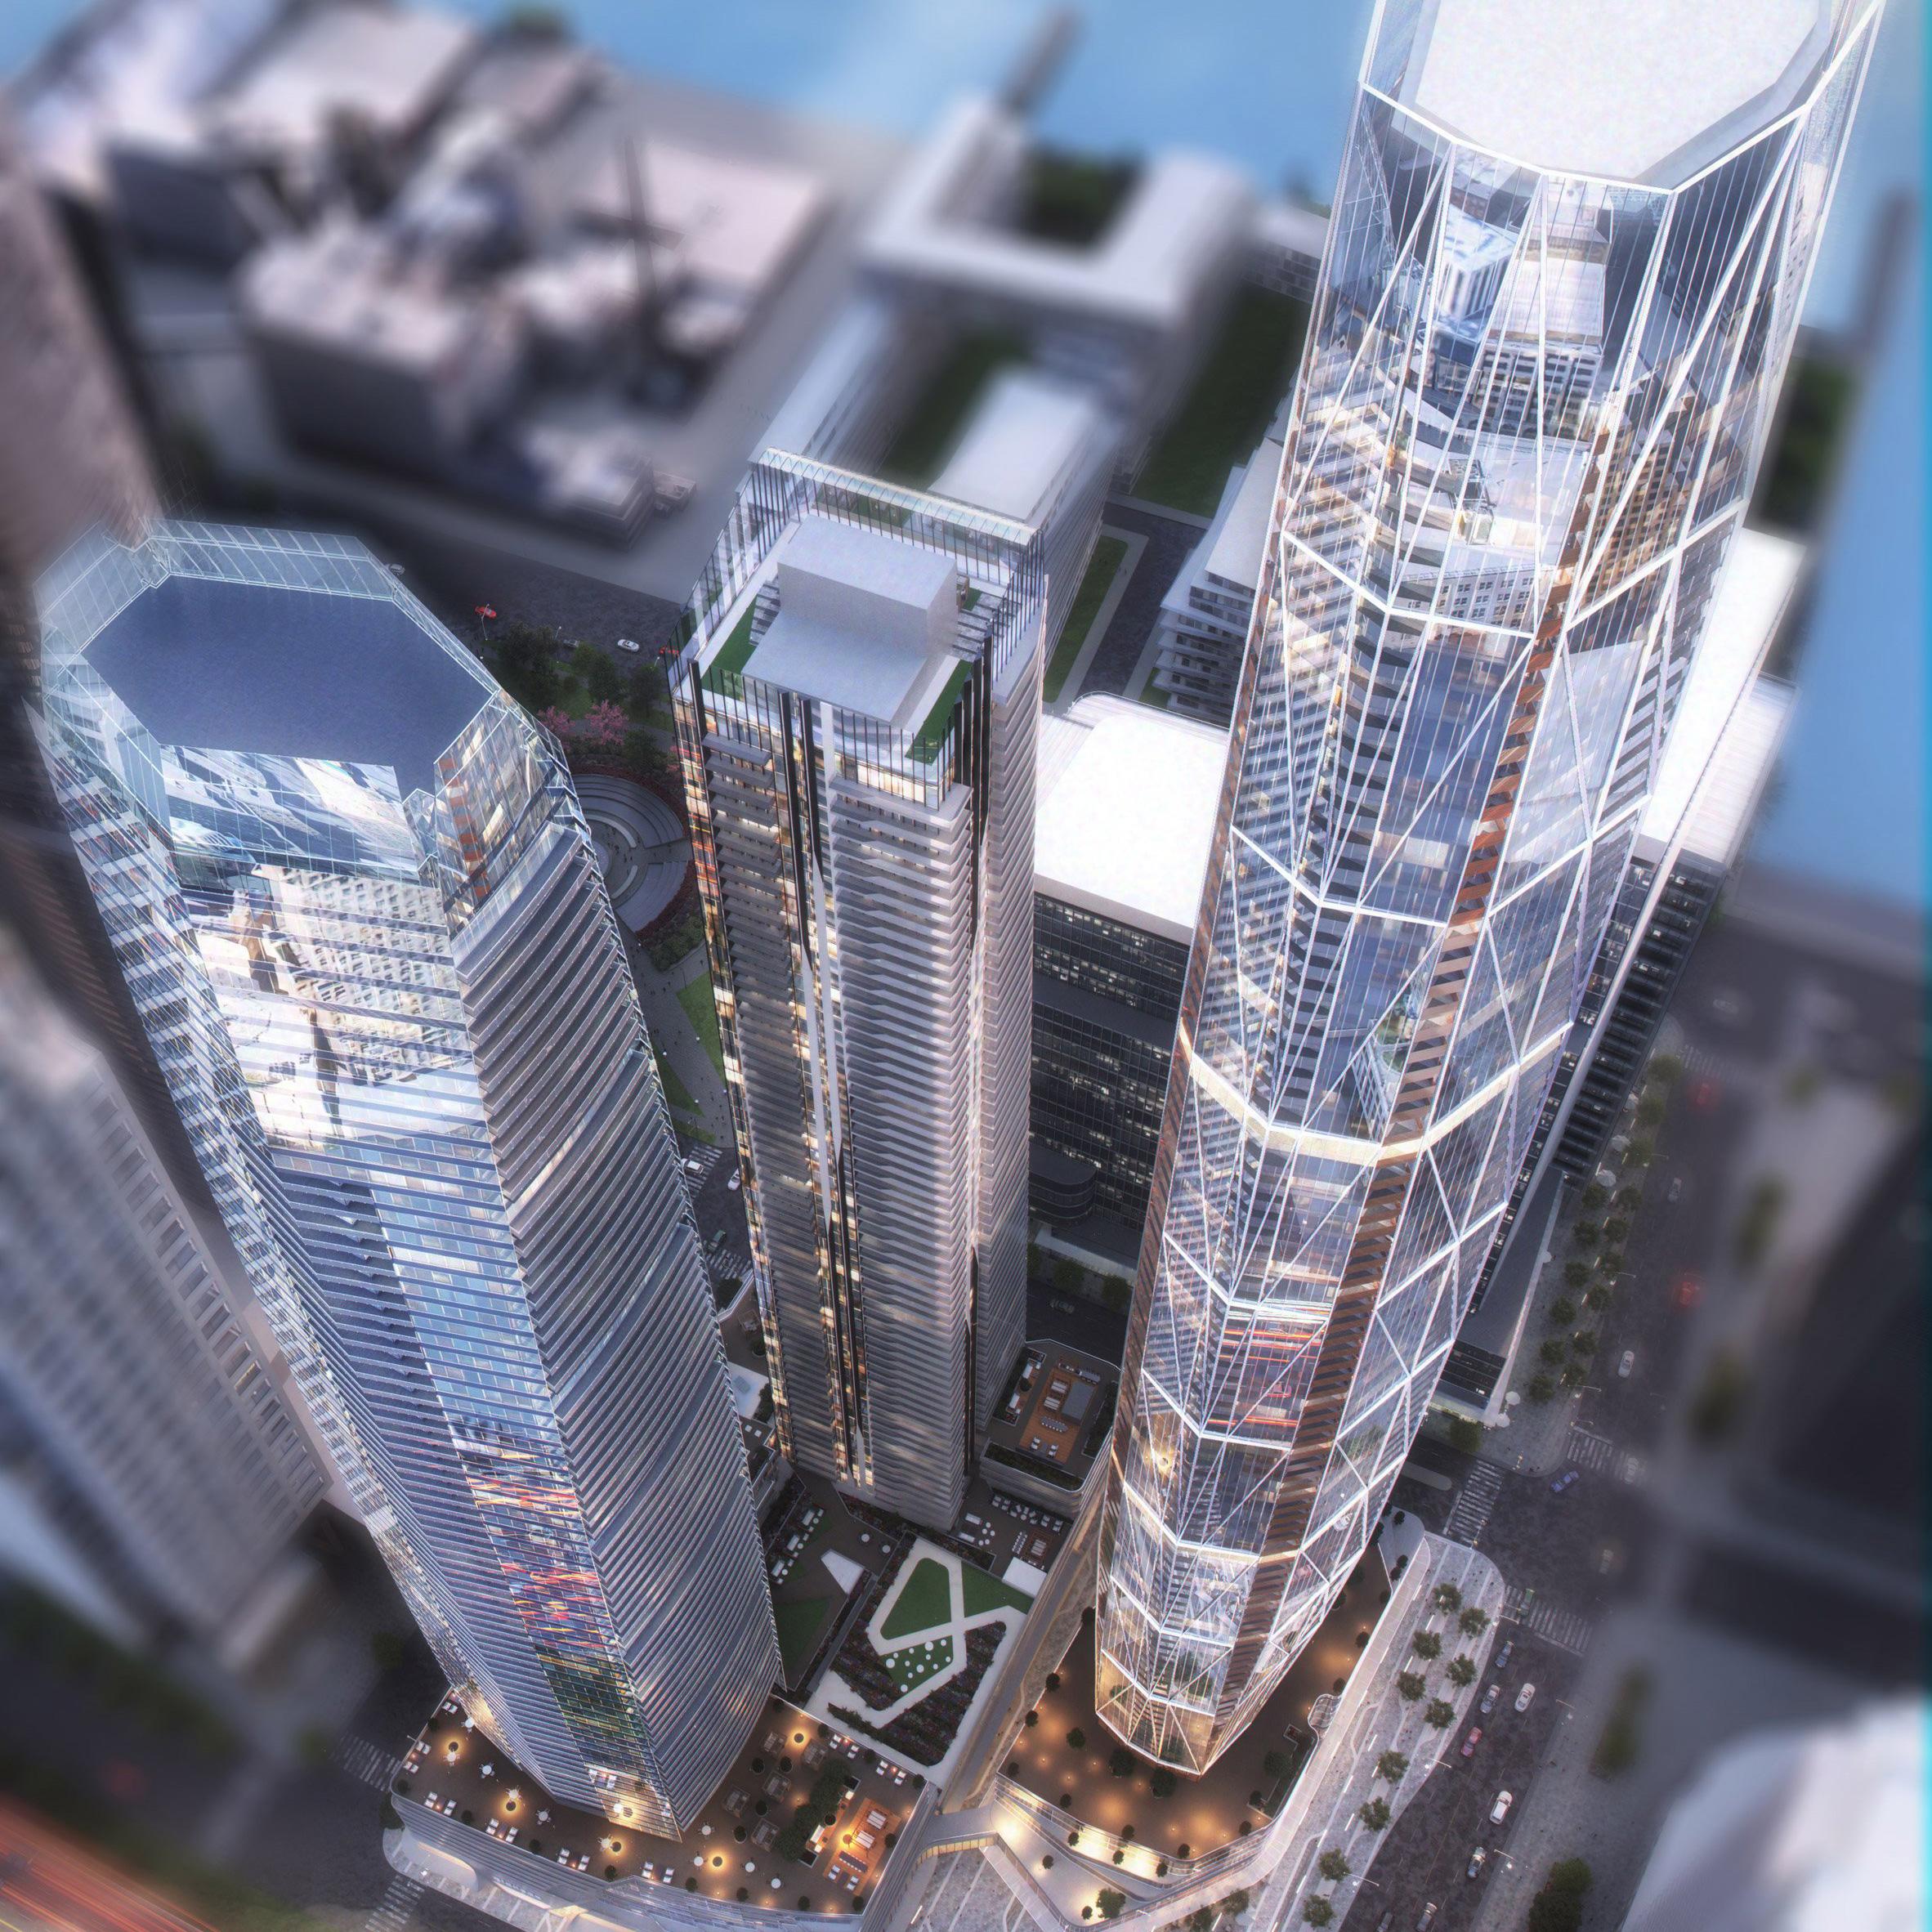 This week, Toronto and Frankfurt announced major urban developments